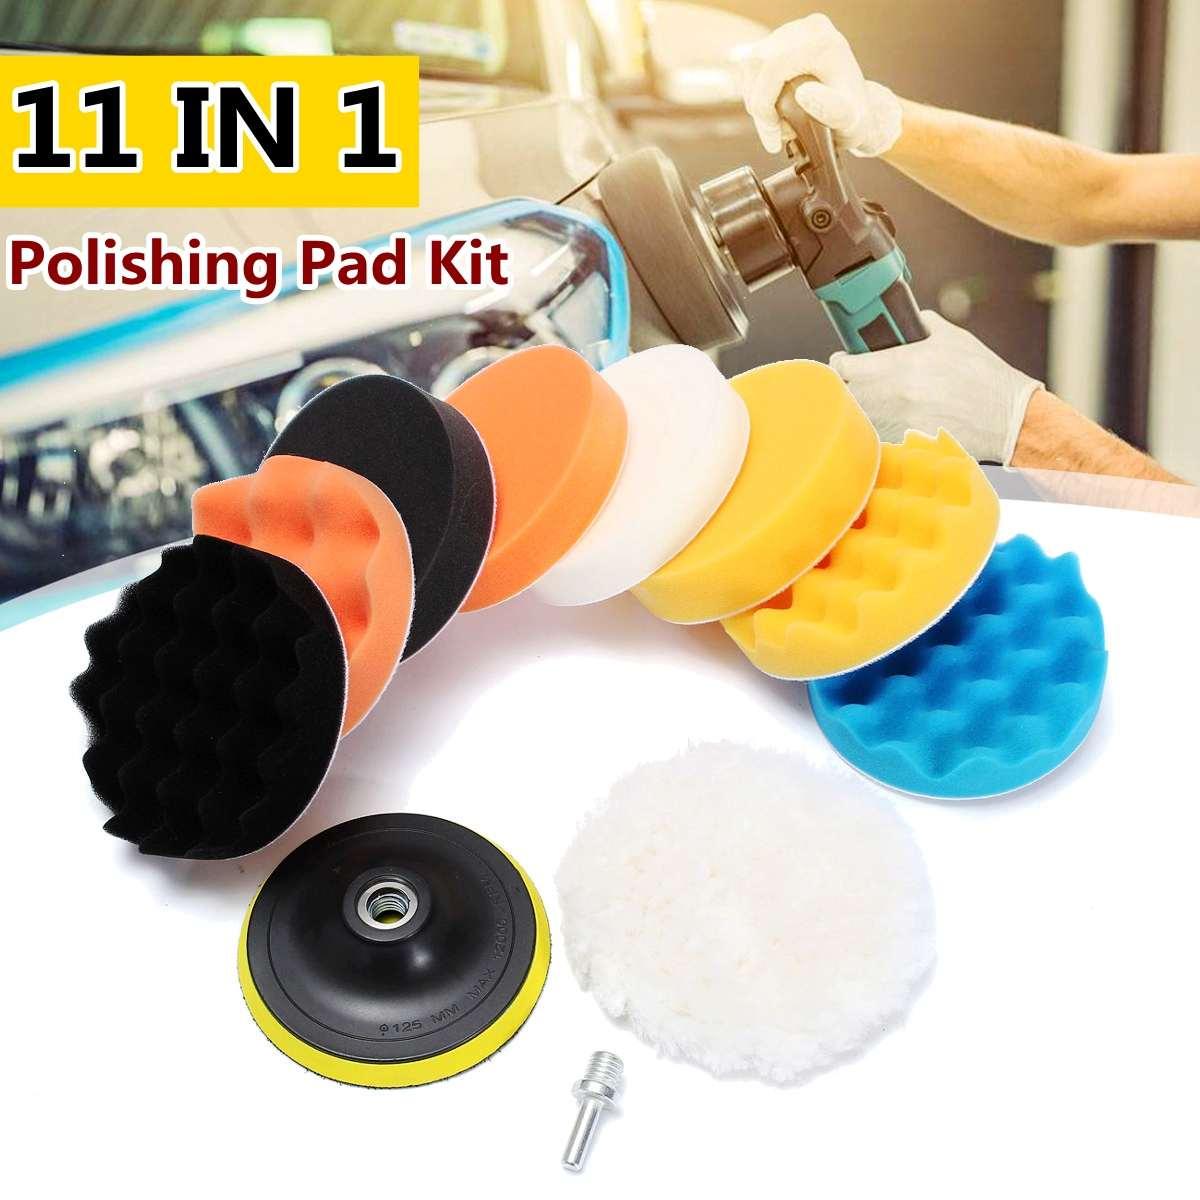 Car Polishing Pad Kit Tools Lot Drill Adapter Sponge Waxing Buffing Compound